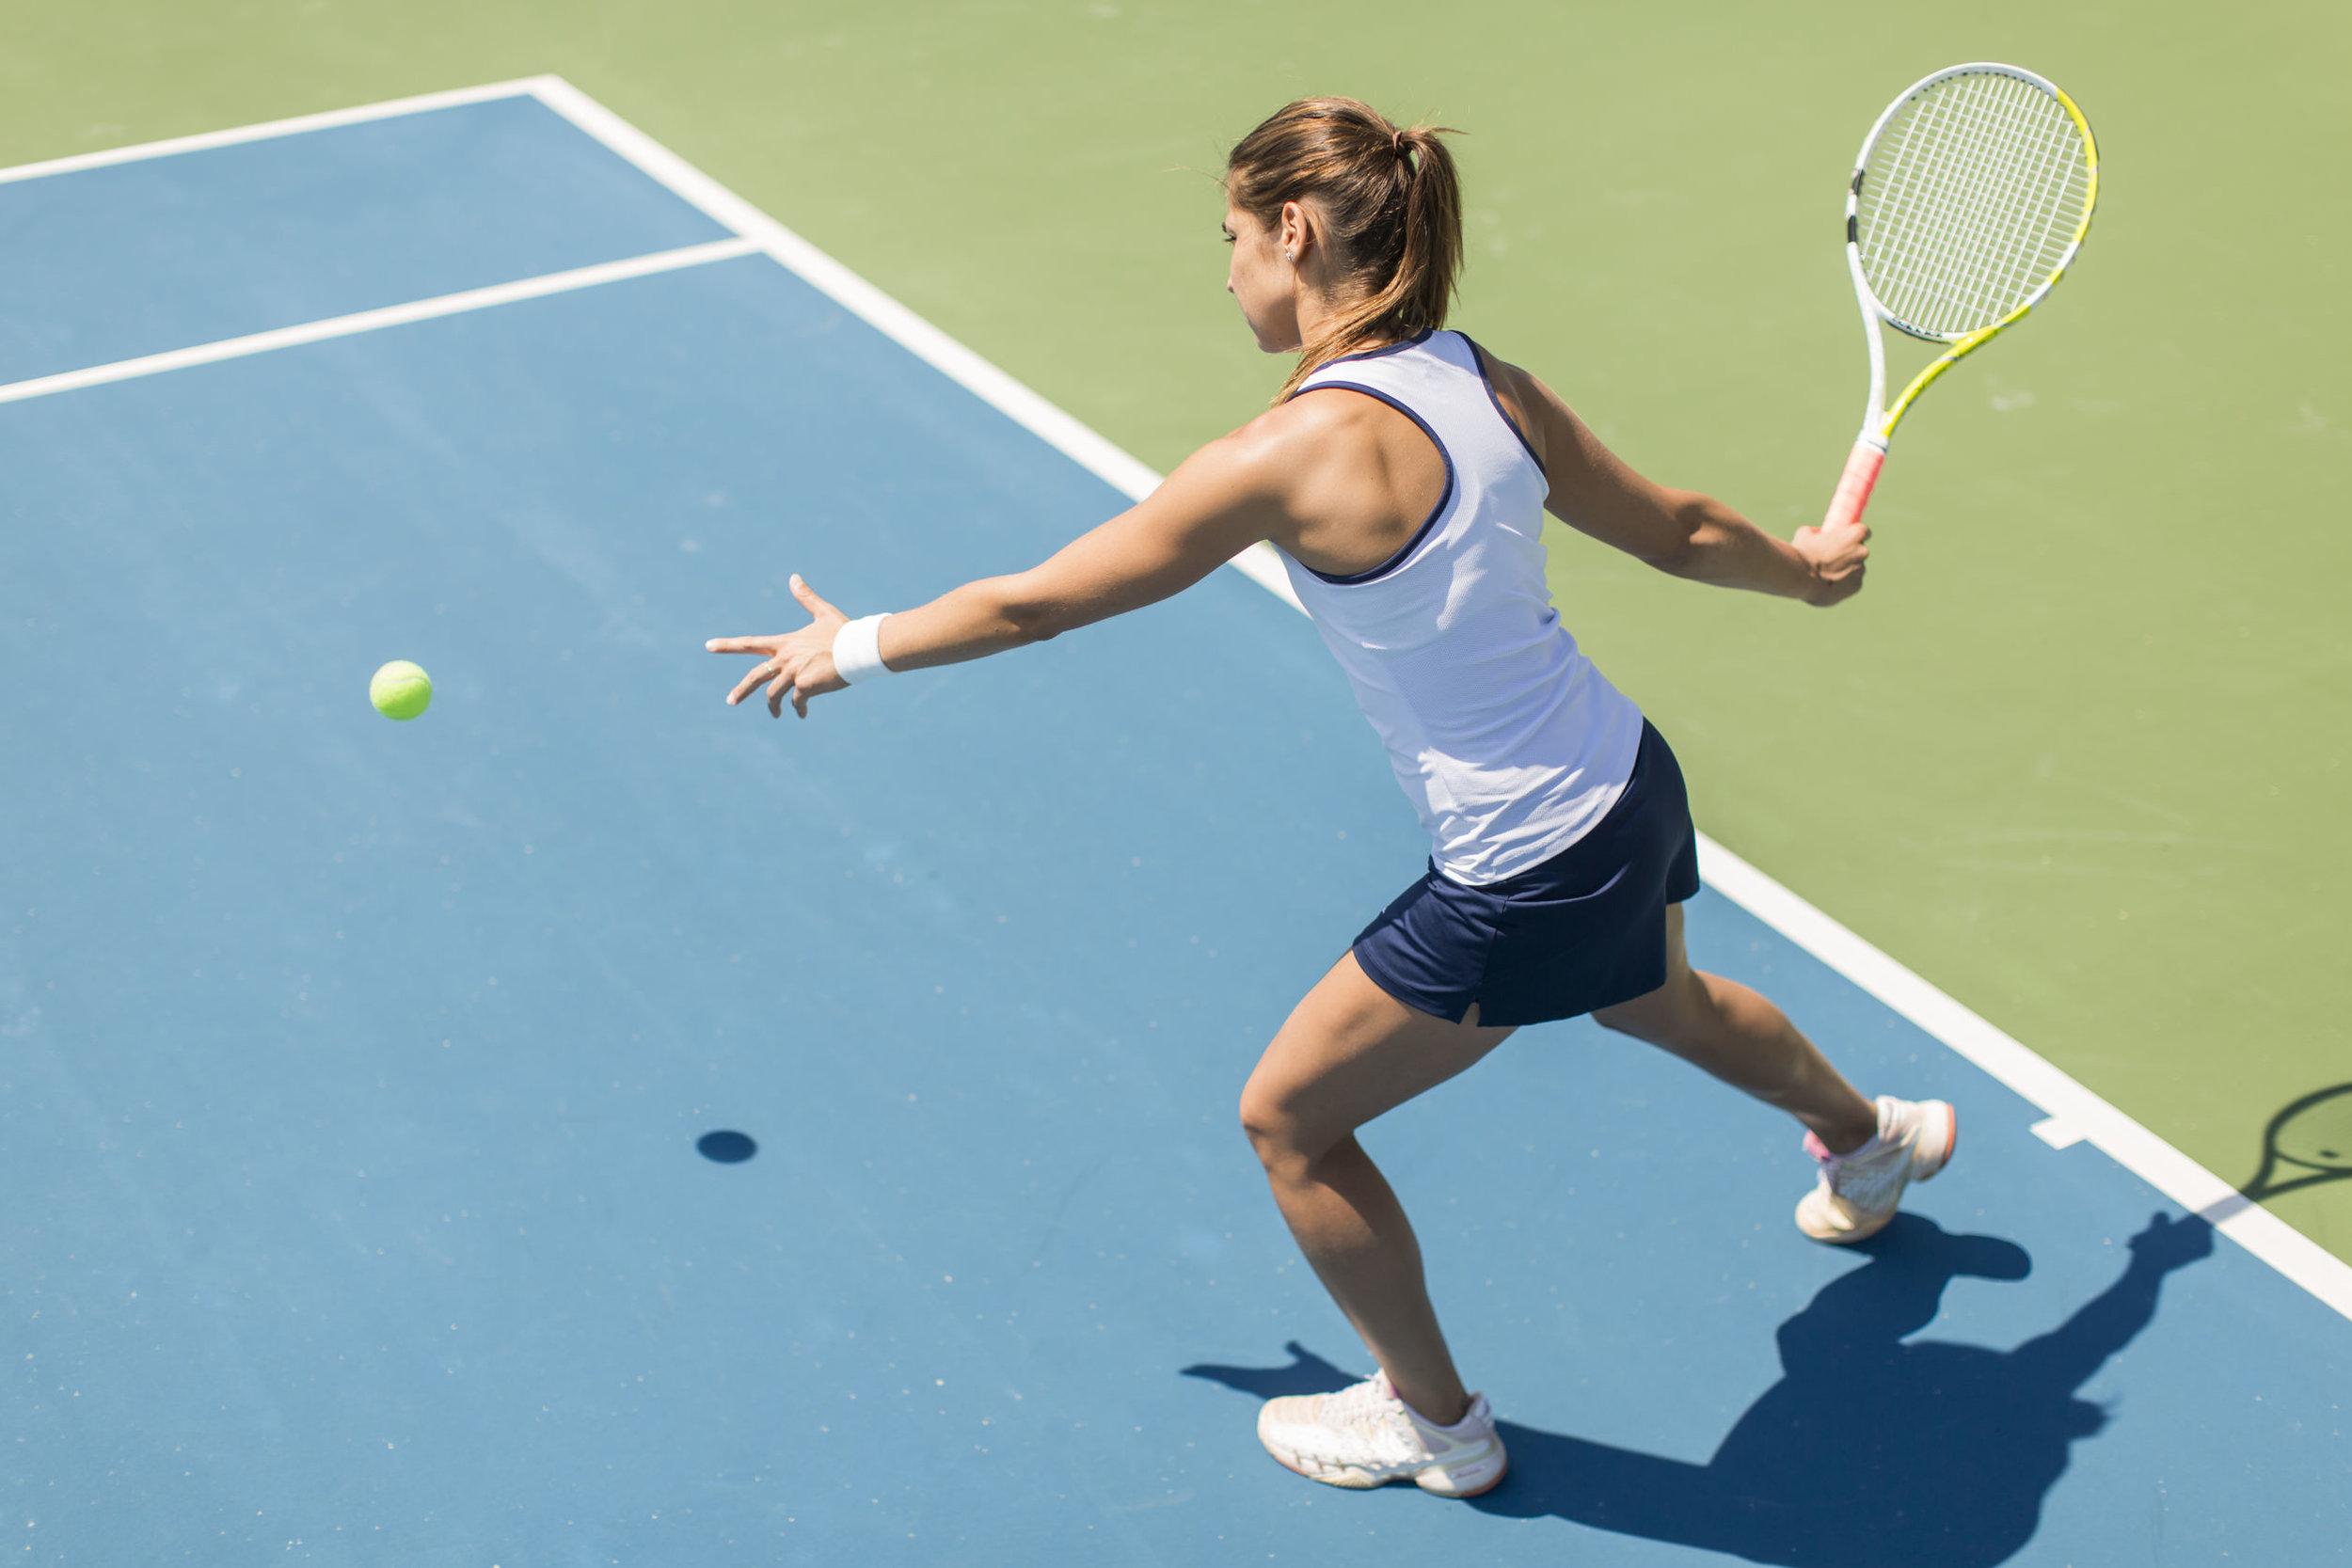 Adult Tennis Programs - At Creekside Tennis & Swim Club